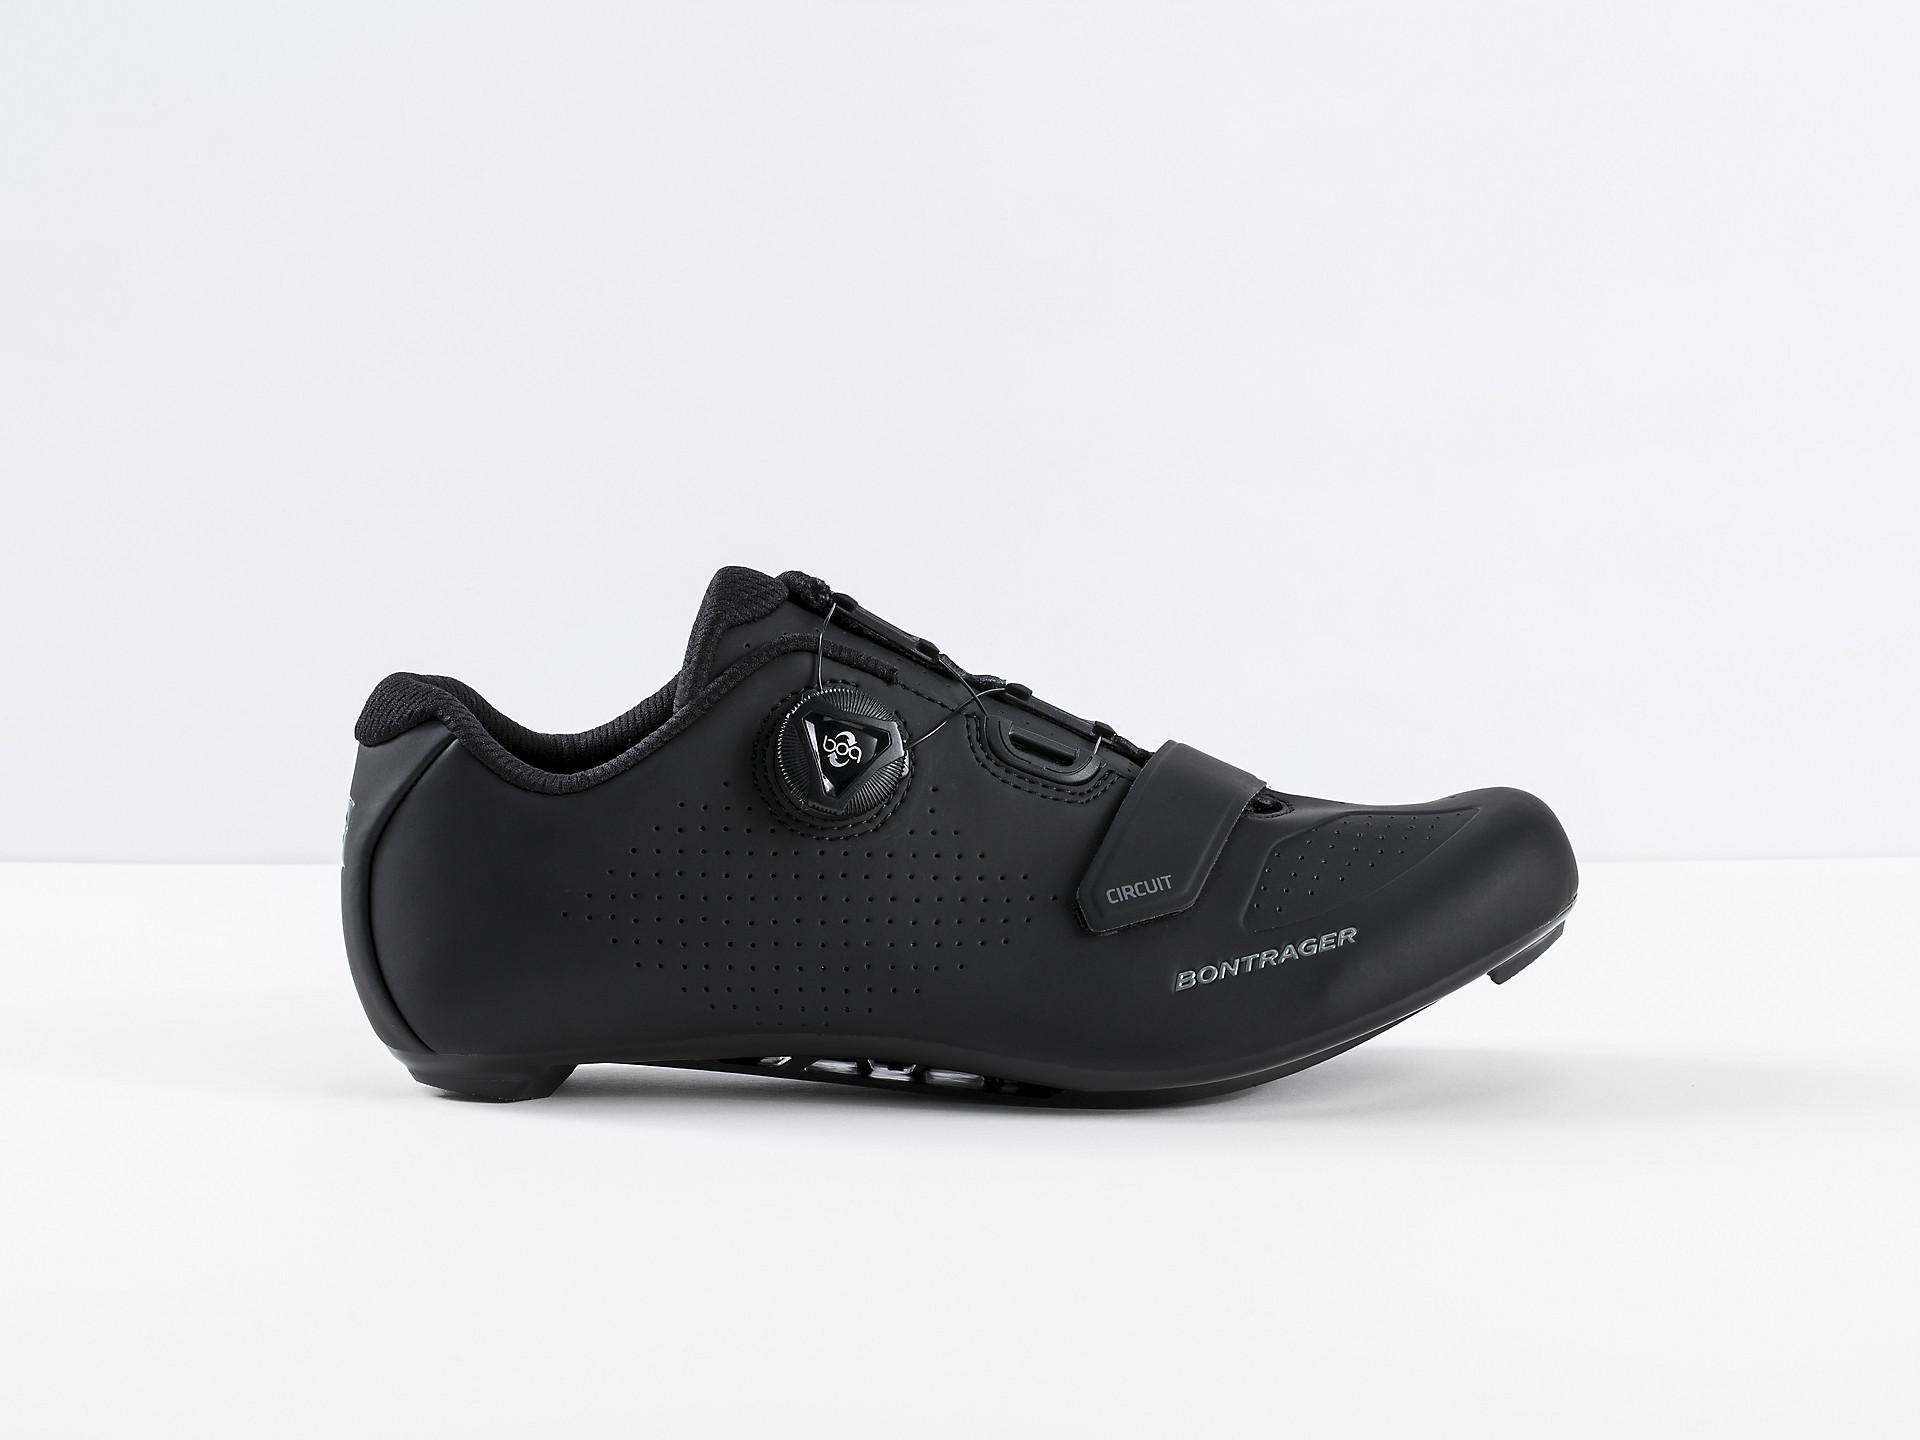 d0575208a04 Bontrager Circuit Road Shoe | Trek Bikes